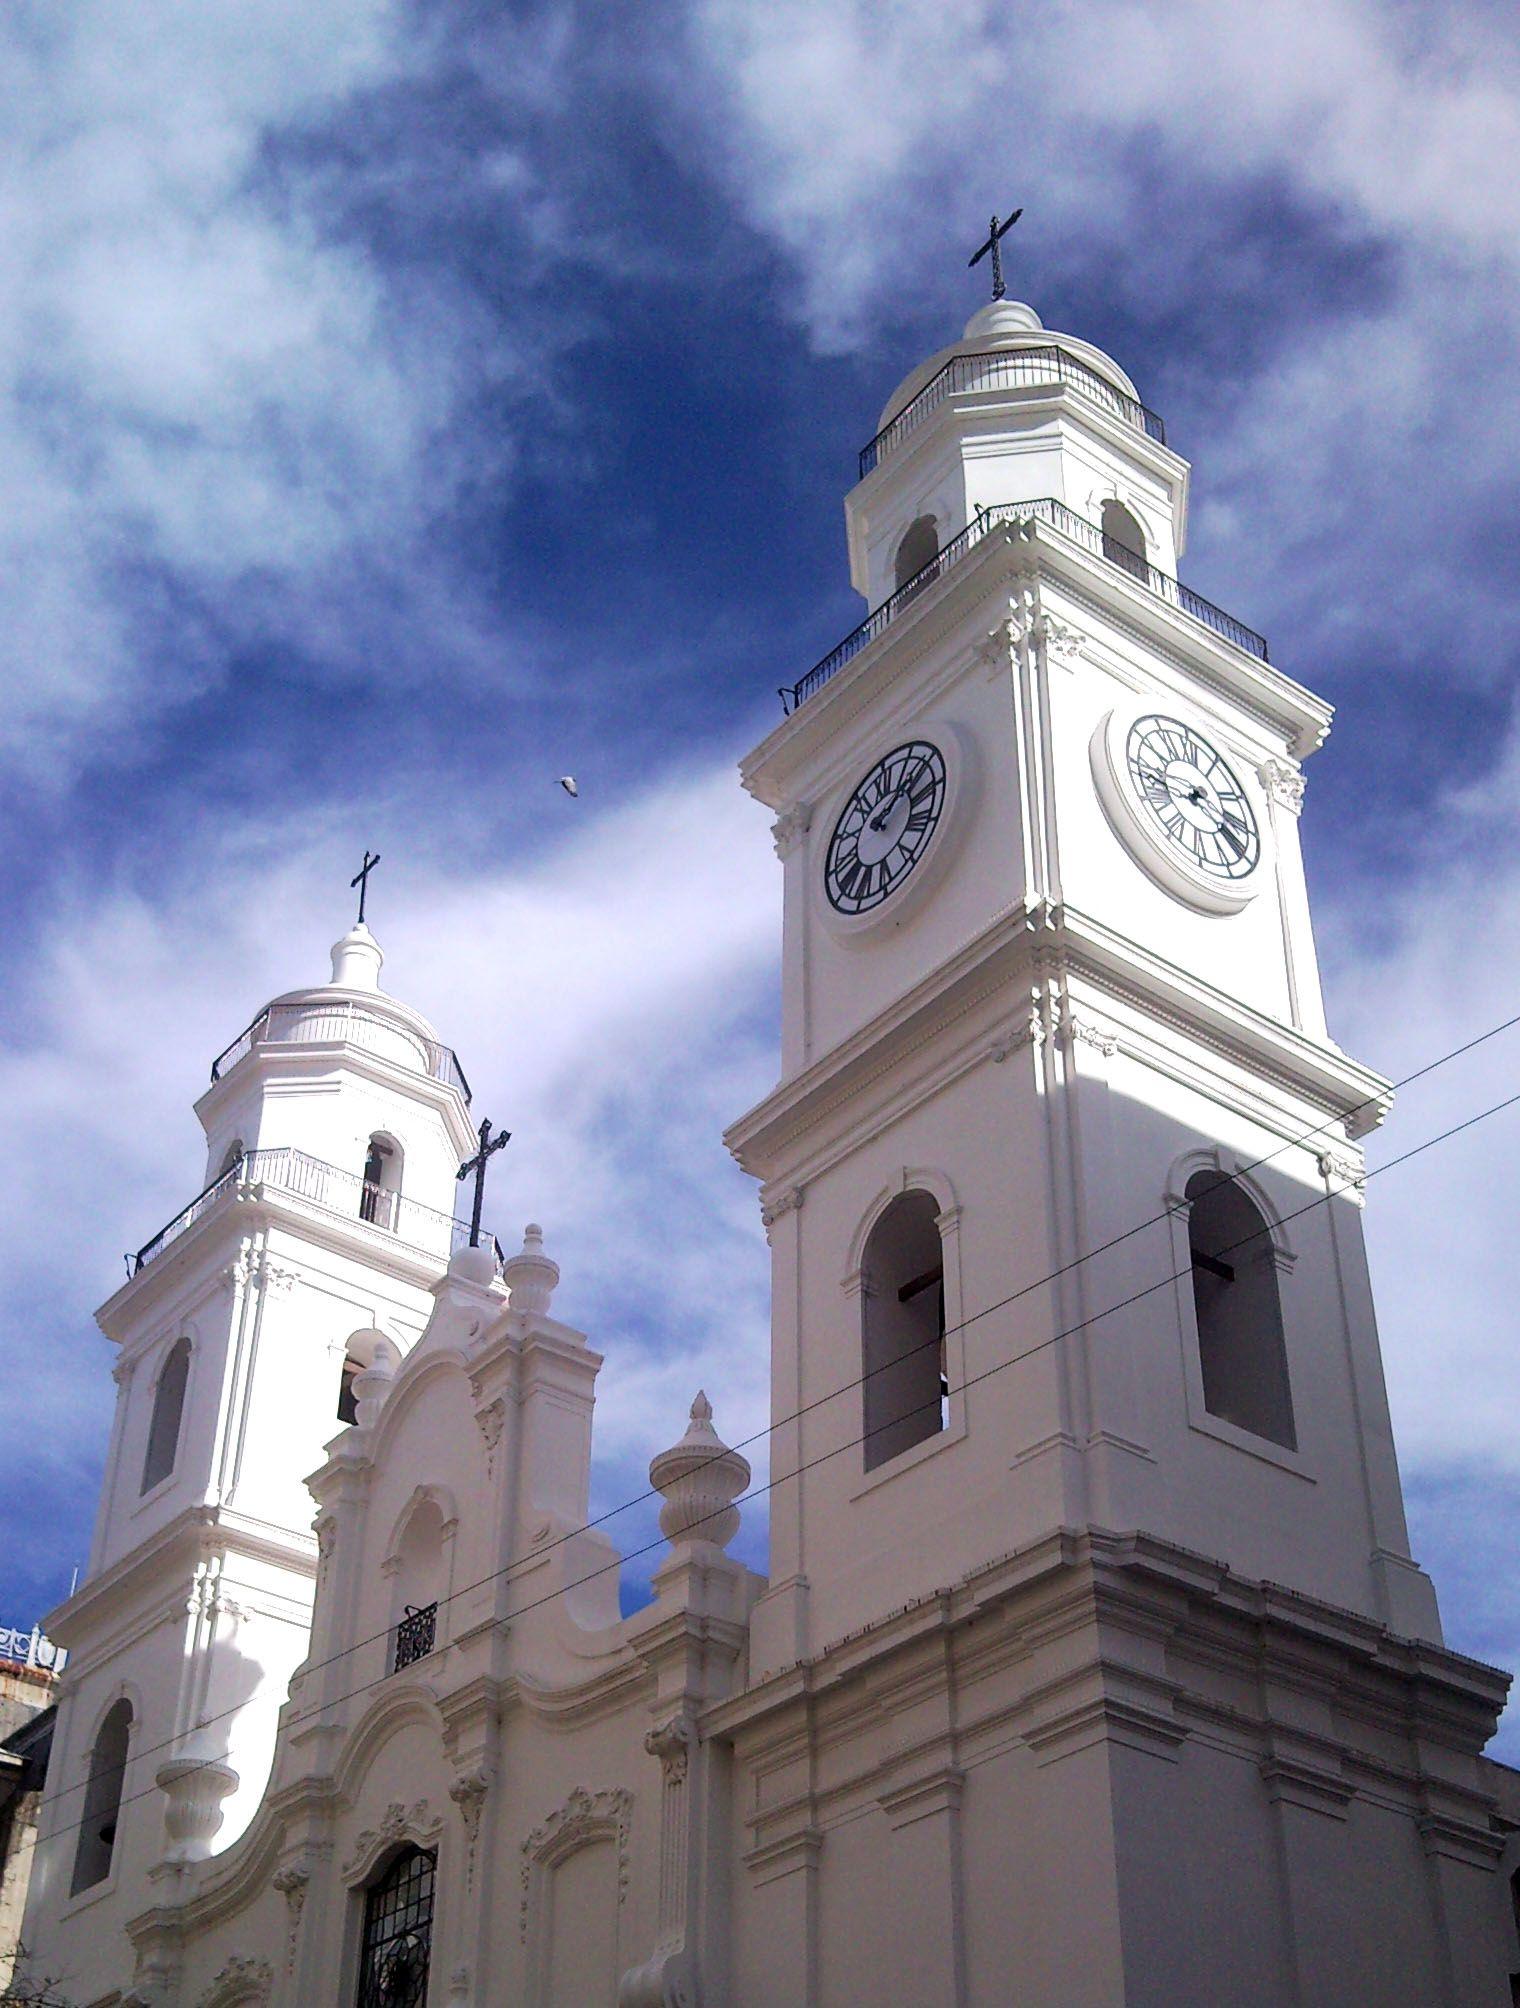 #buenos aires #nubes #sol #fotografia #photo #church